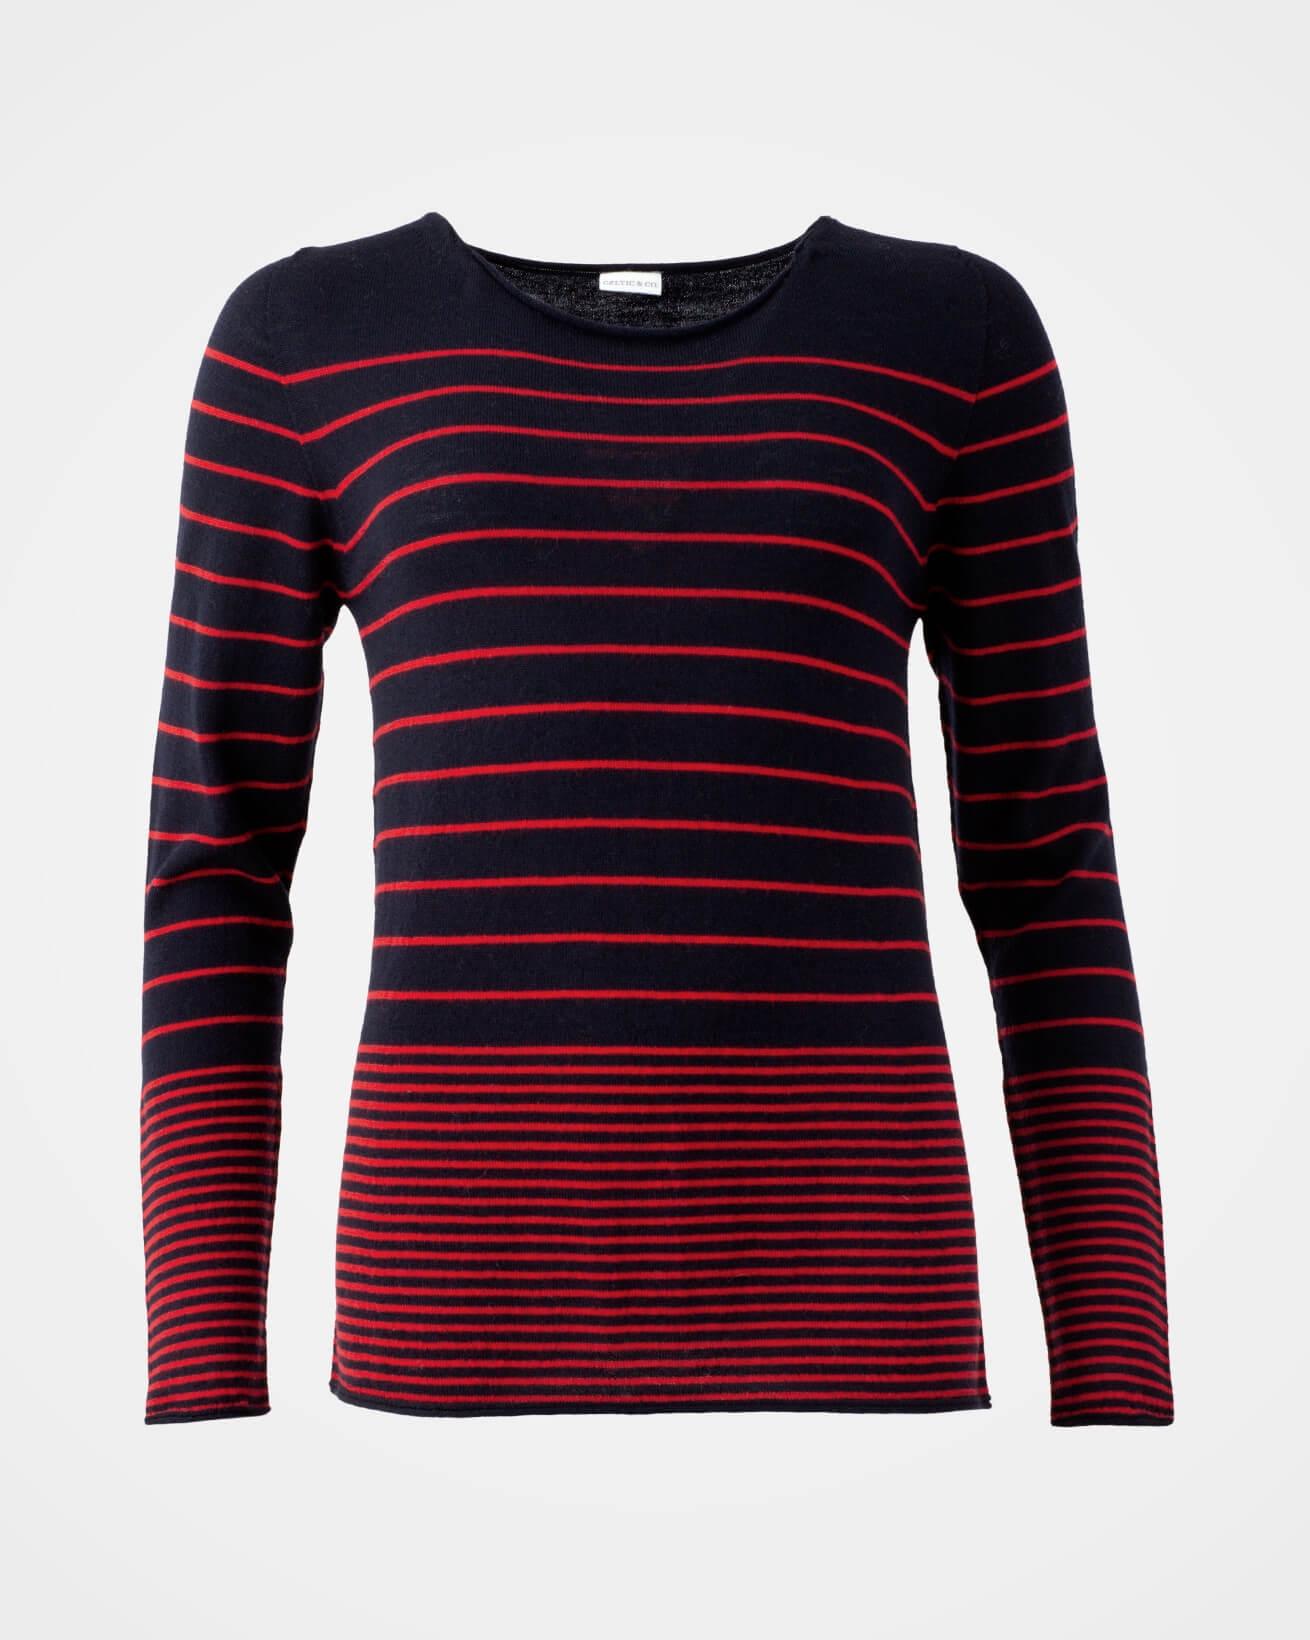 7036_fine-knit-merino-crew-neck_red-stripe_front_web.jpg